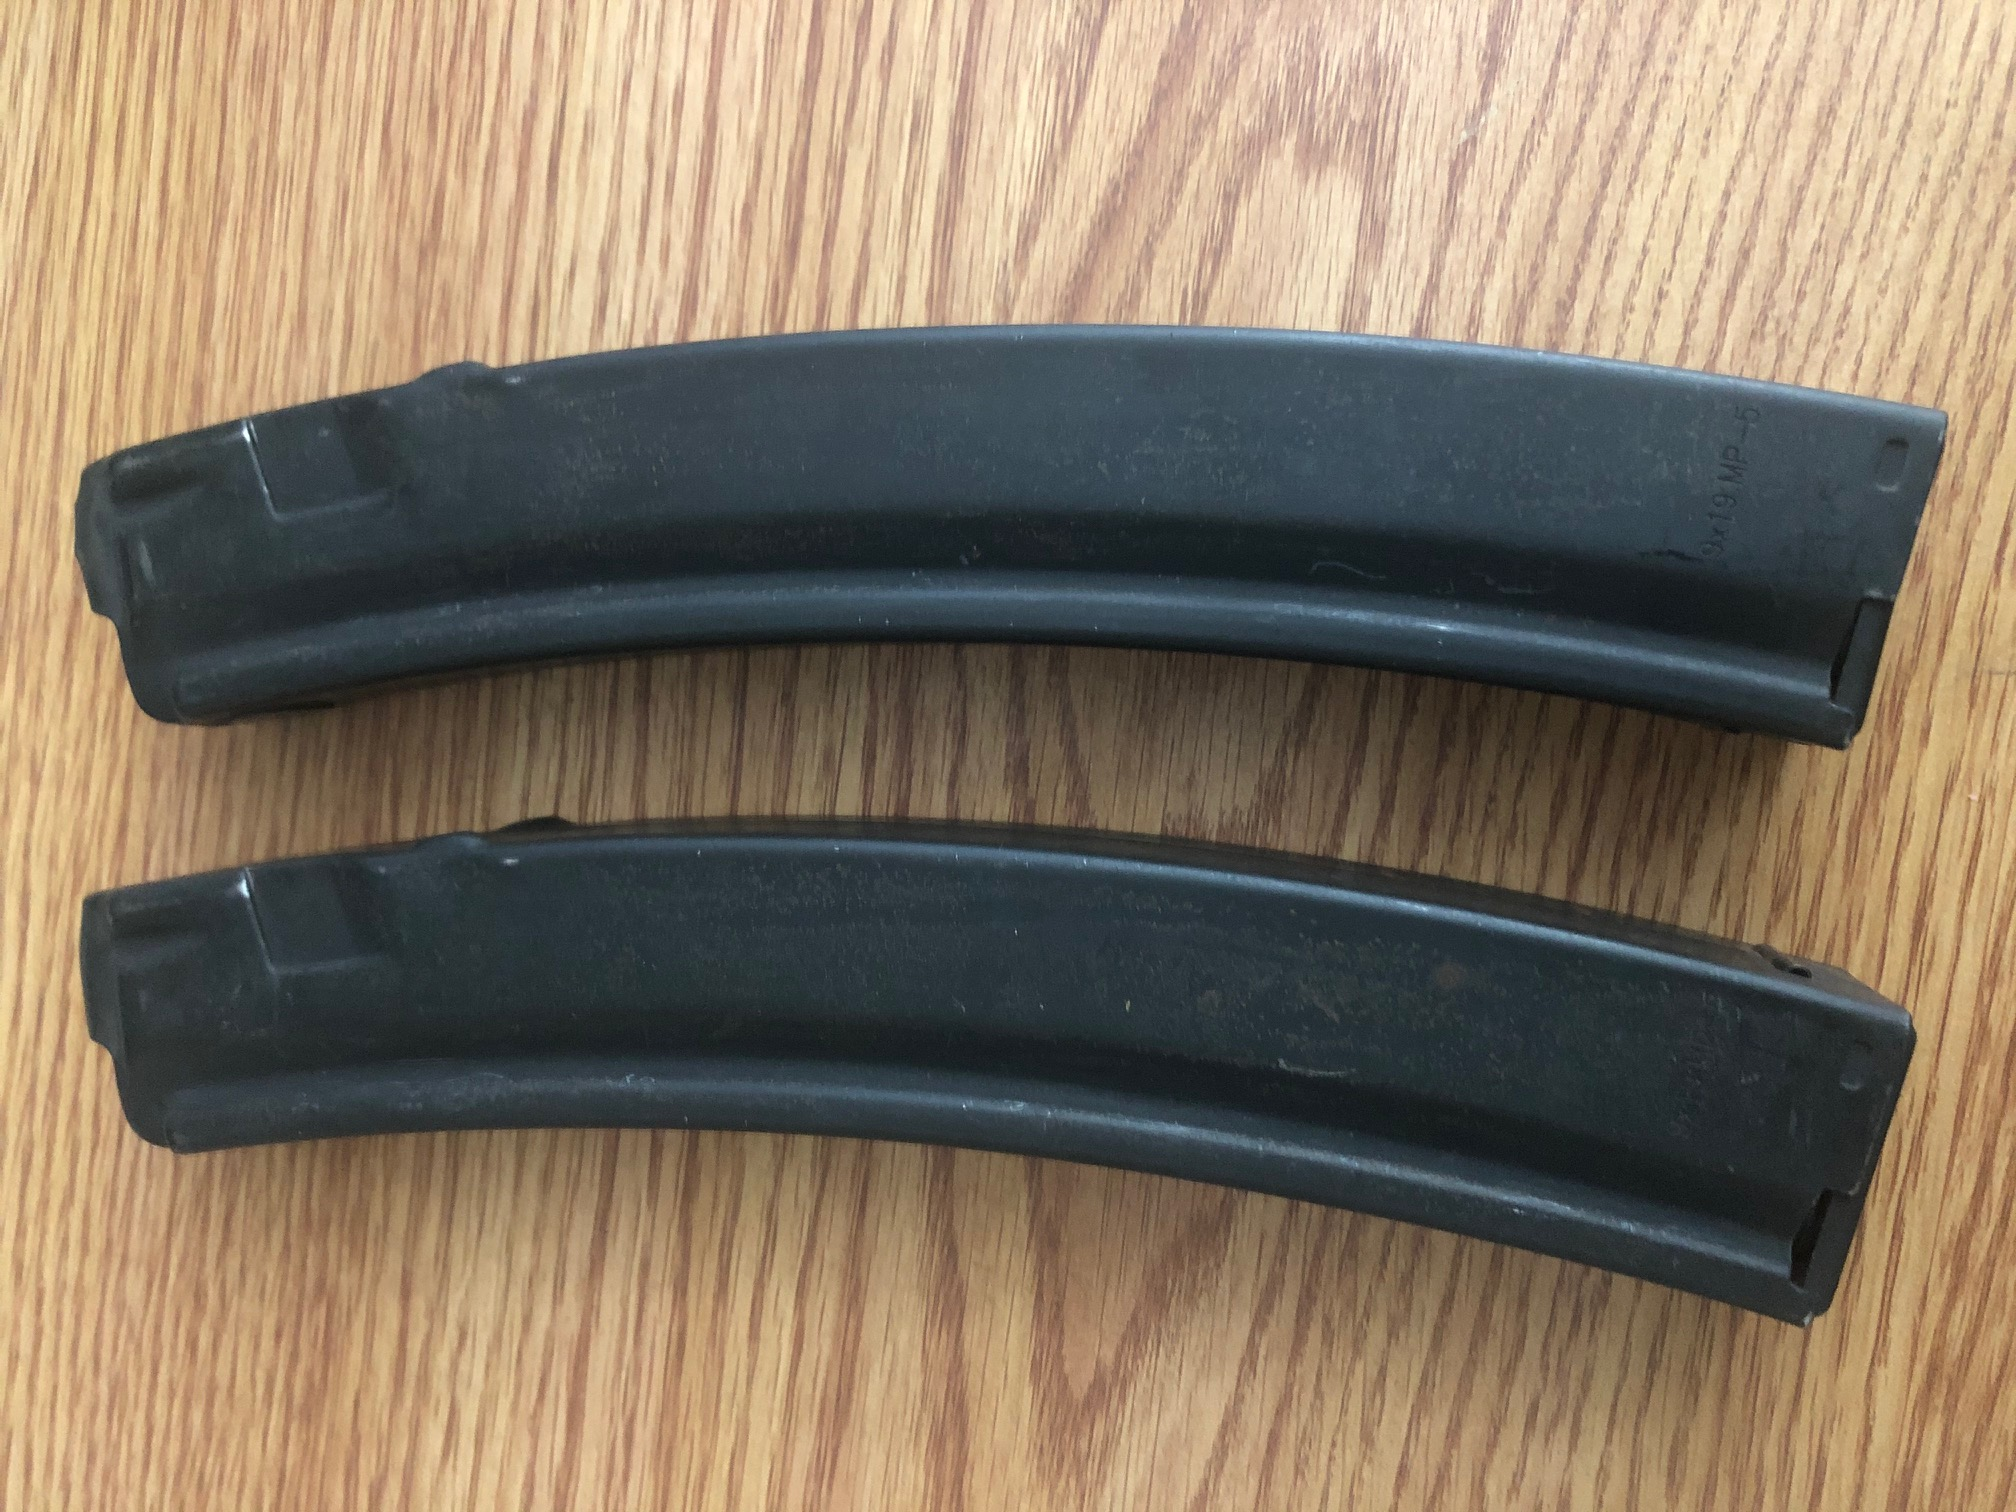 WTS: MP5 mags, one POF niw-img_3983.jpg